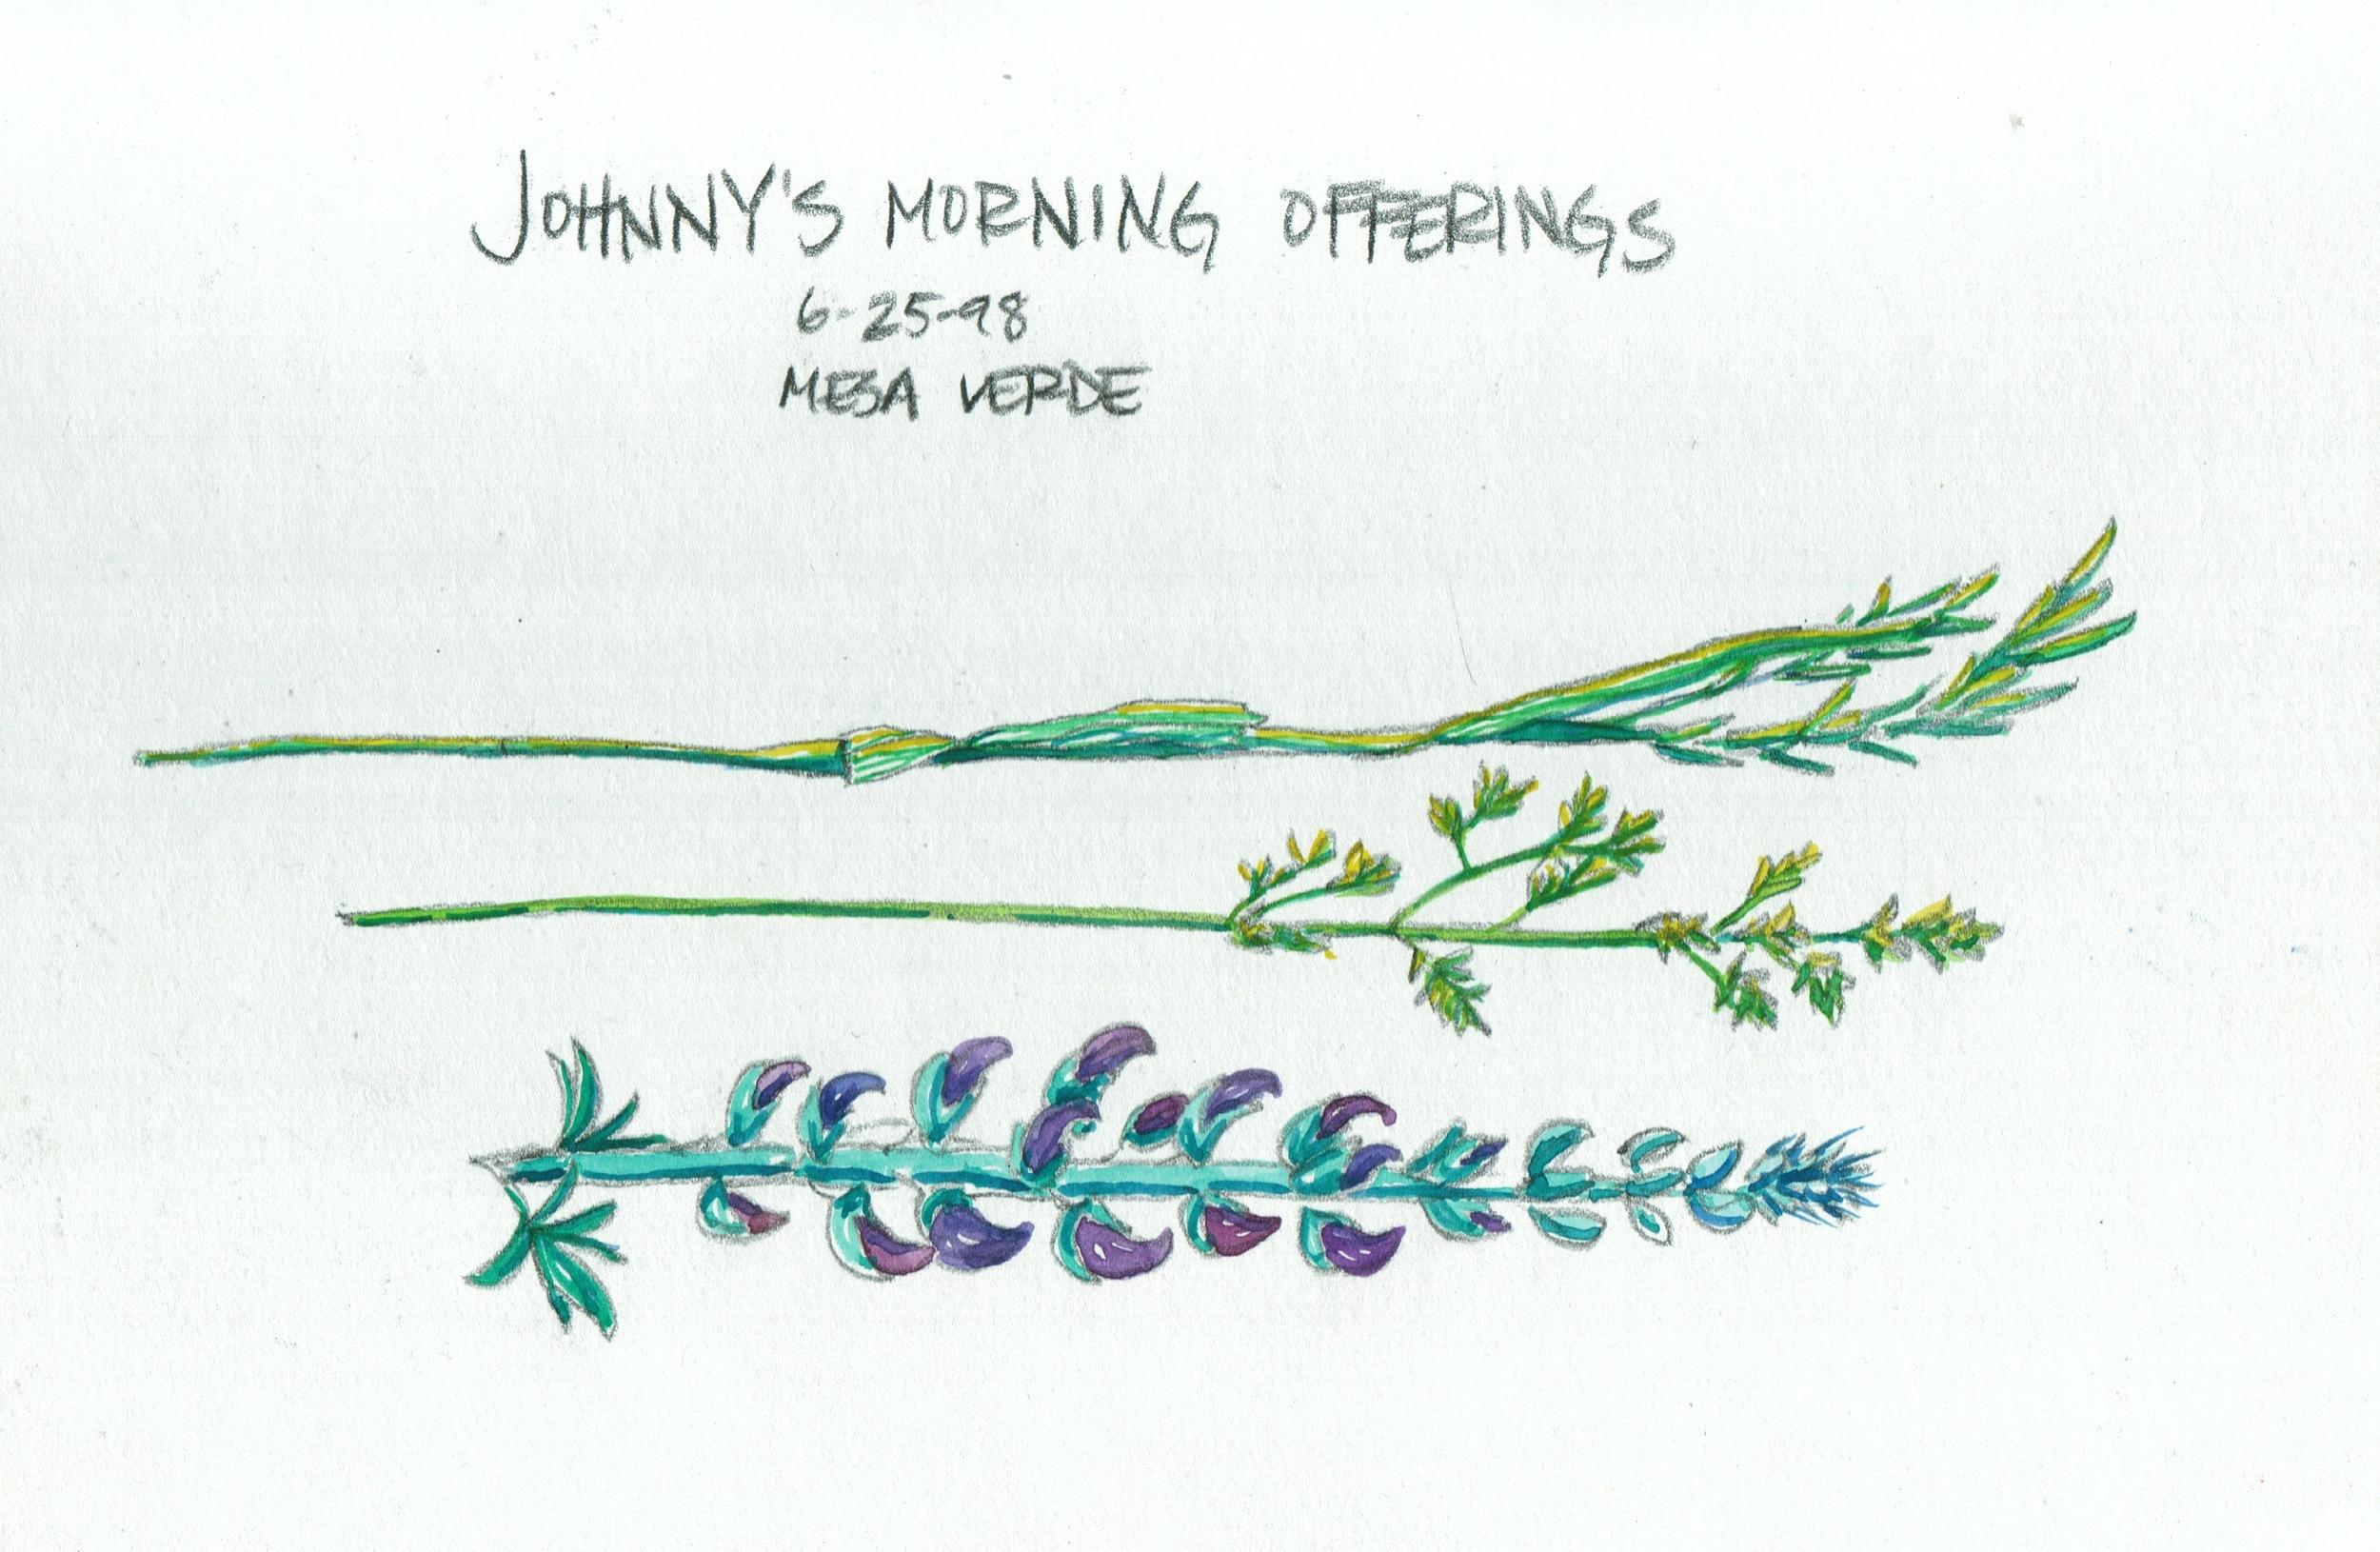 JohnnysOfferings1998.jpeg